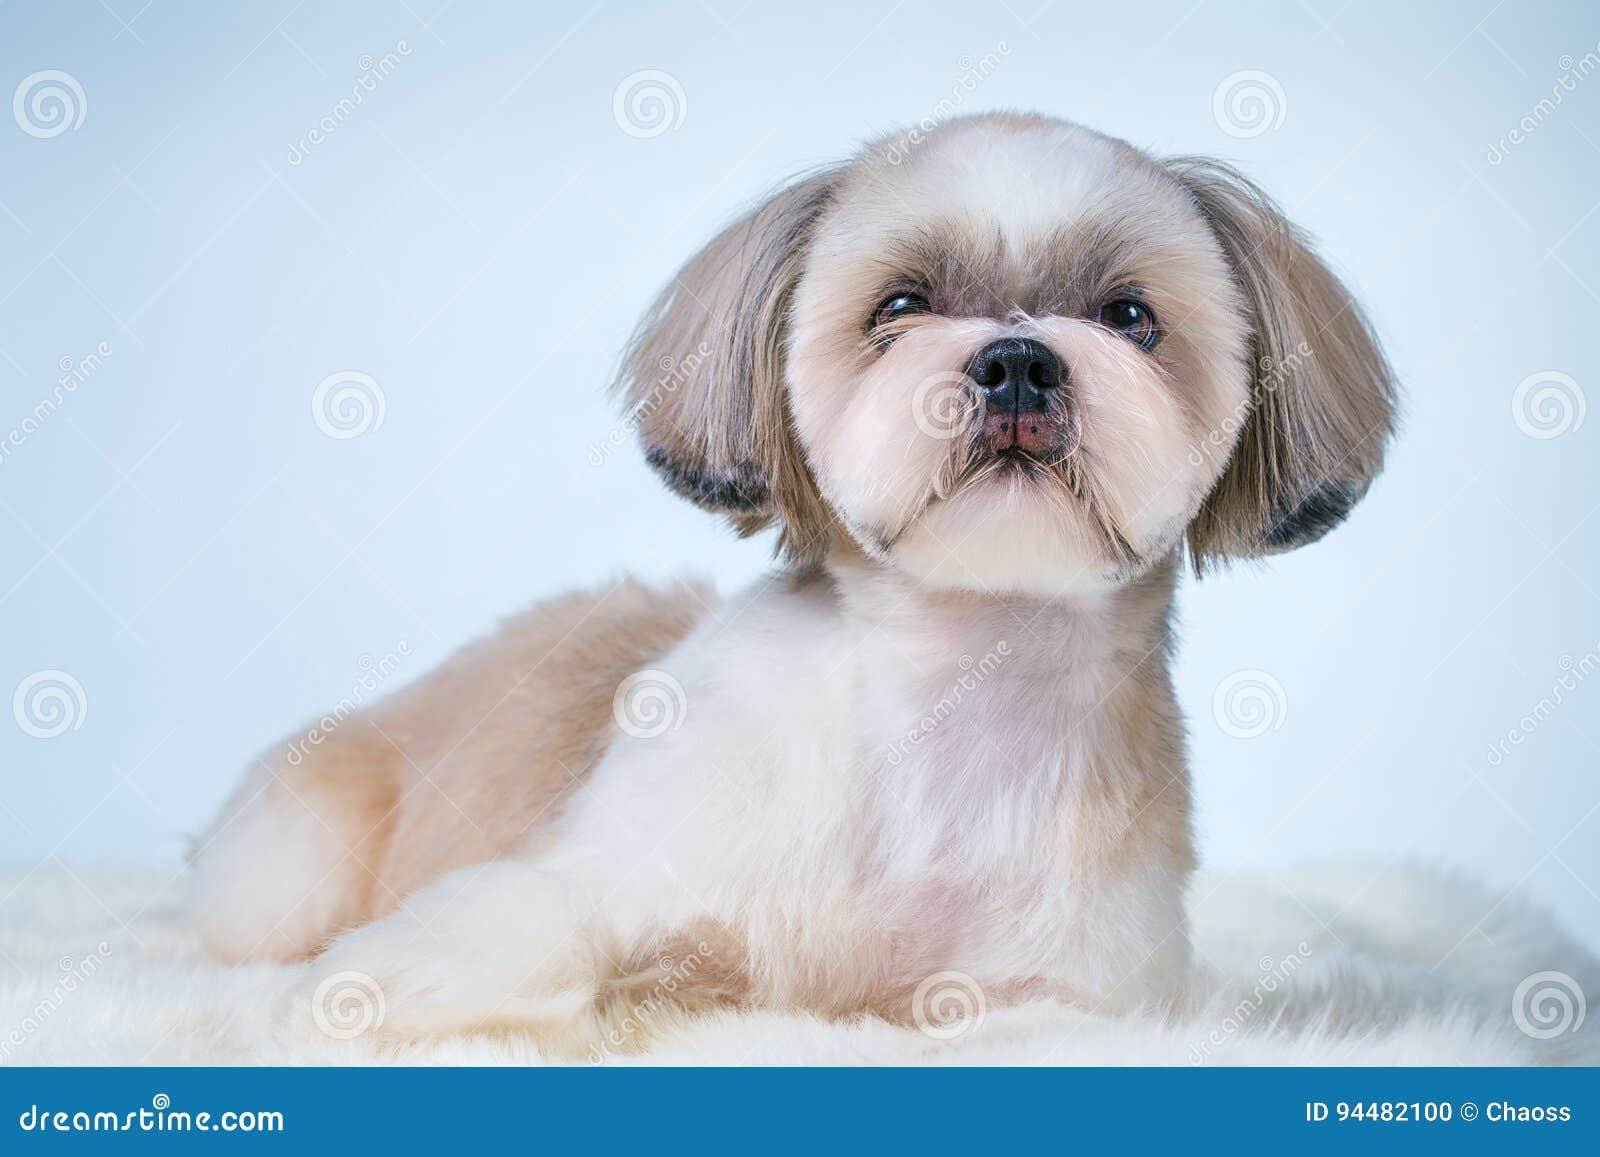 Shih Tzu Dog Stock Photo Image Of Pedigree Carpet Animal 94482100